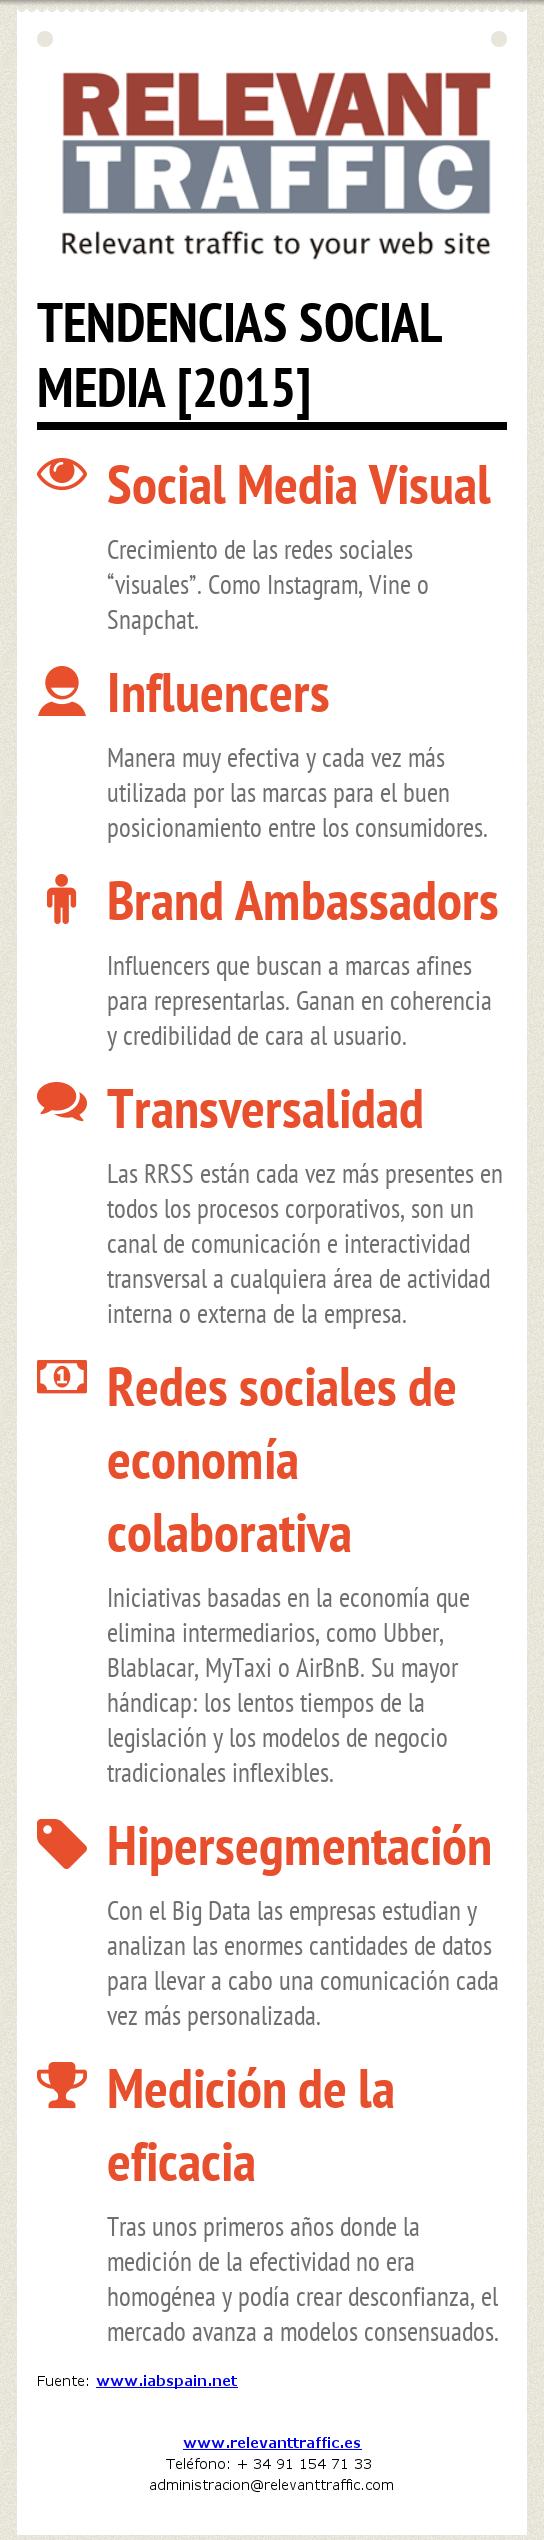 Tendencias Social Media 2015